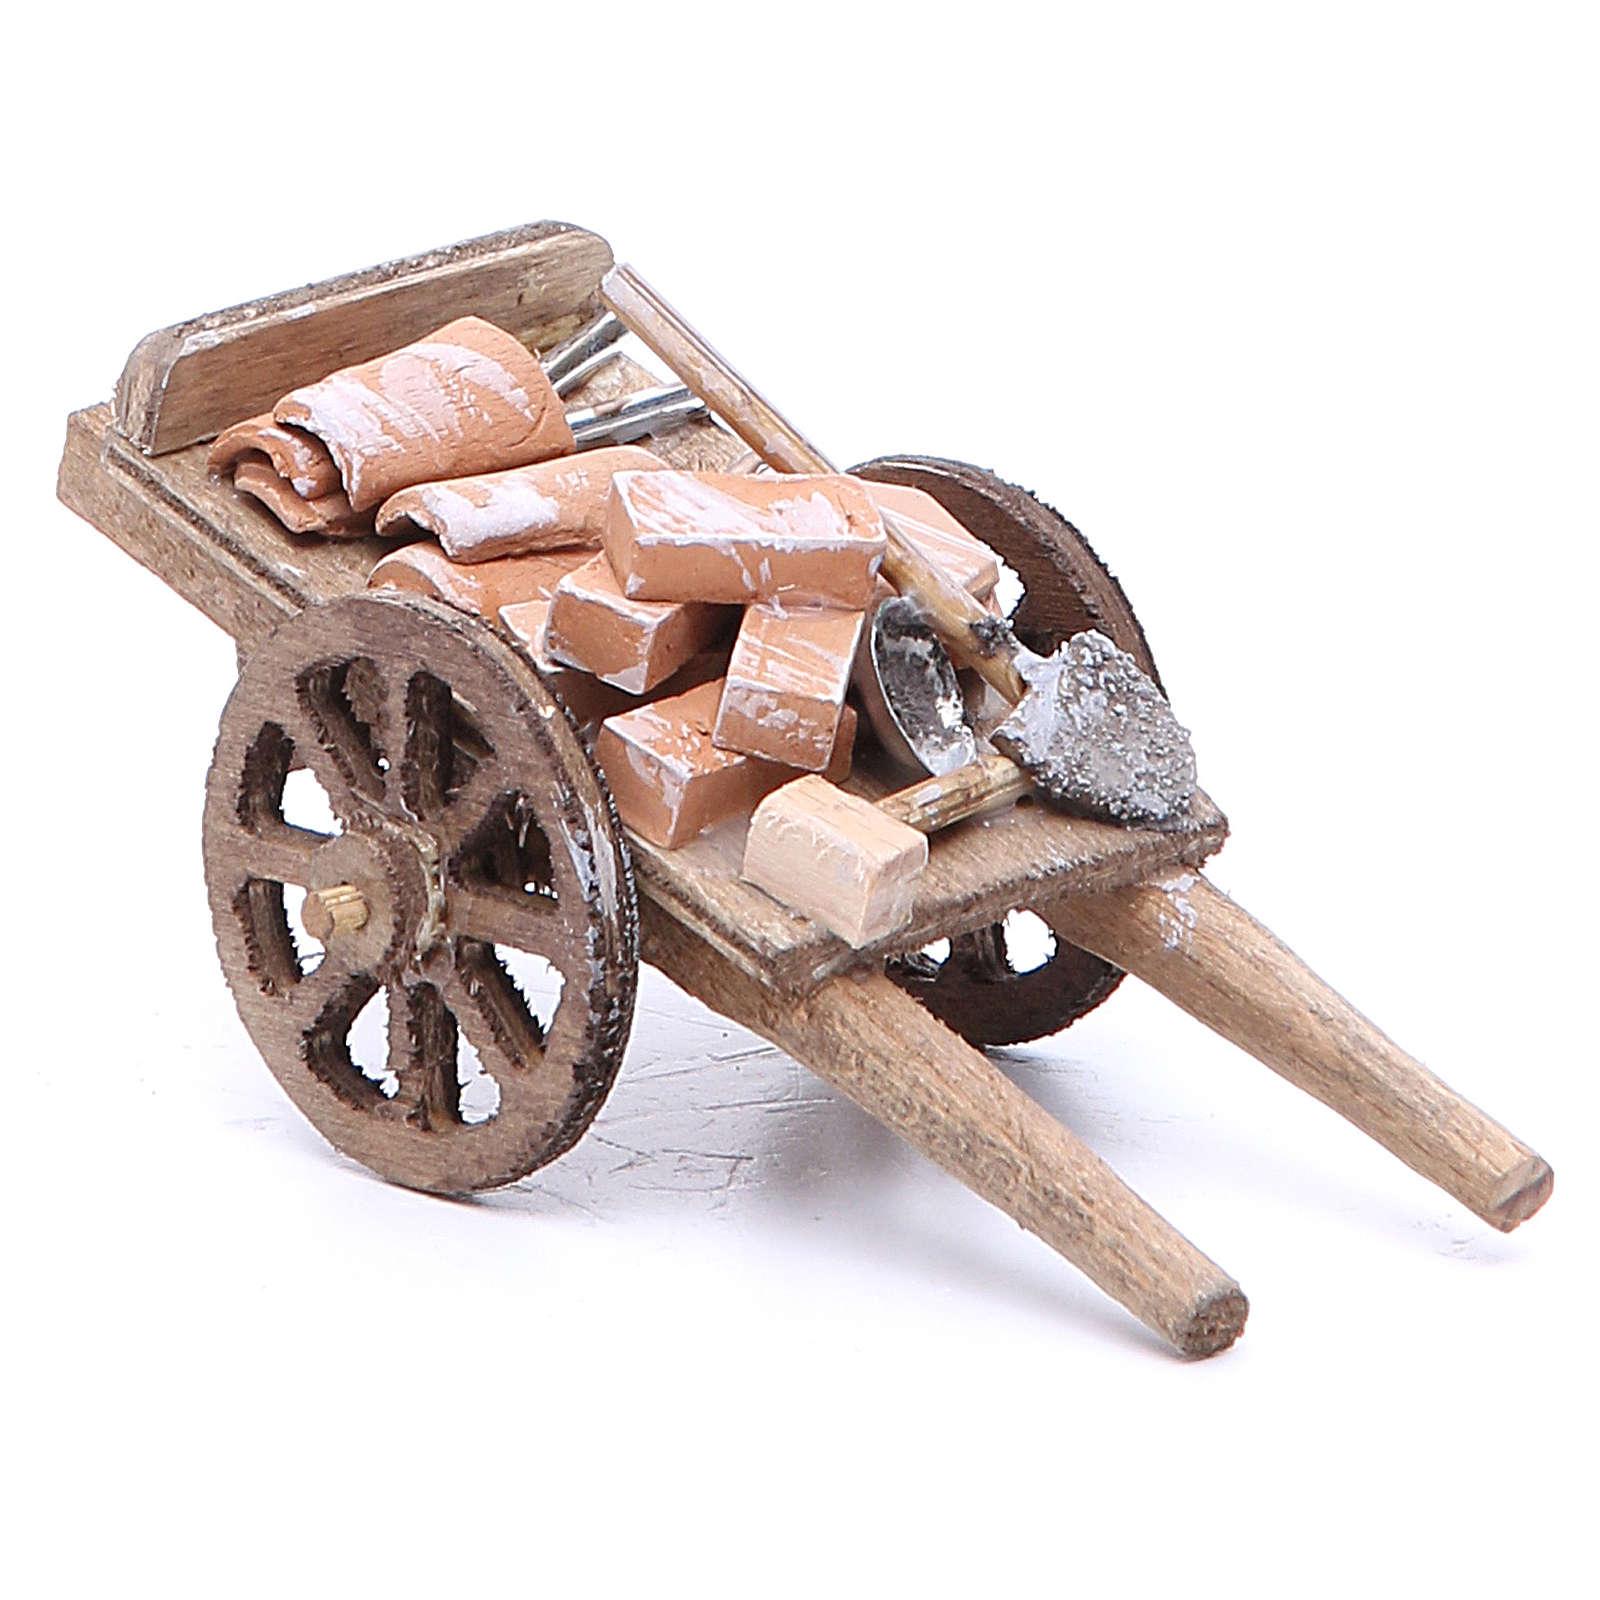 Cart of the builder for Neapolitan Nativity, measuring 6x11x5cm 4